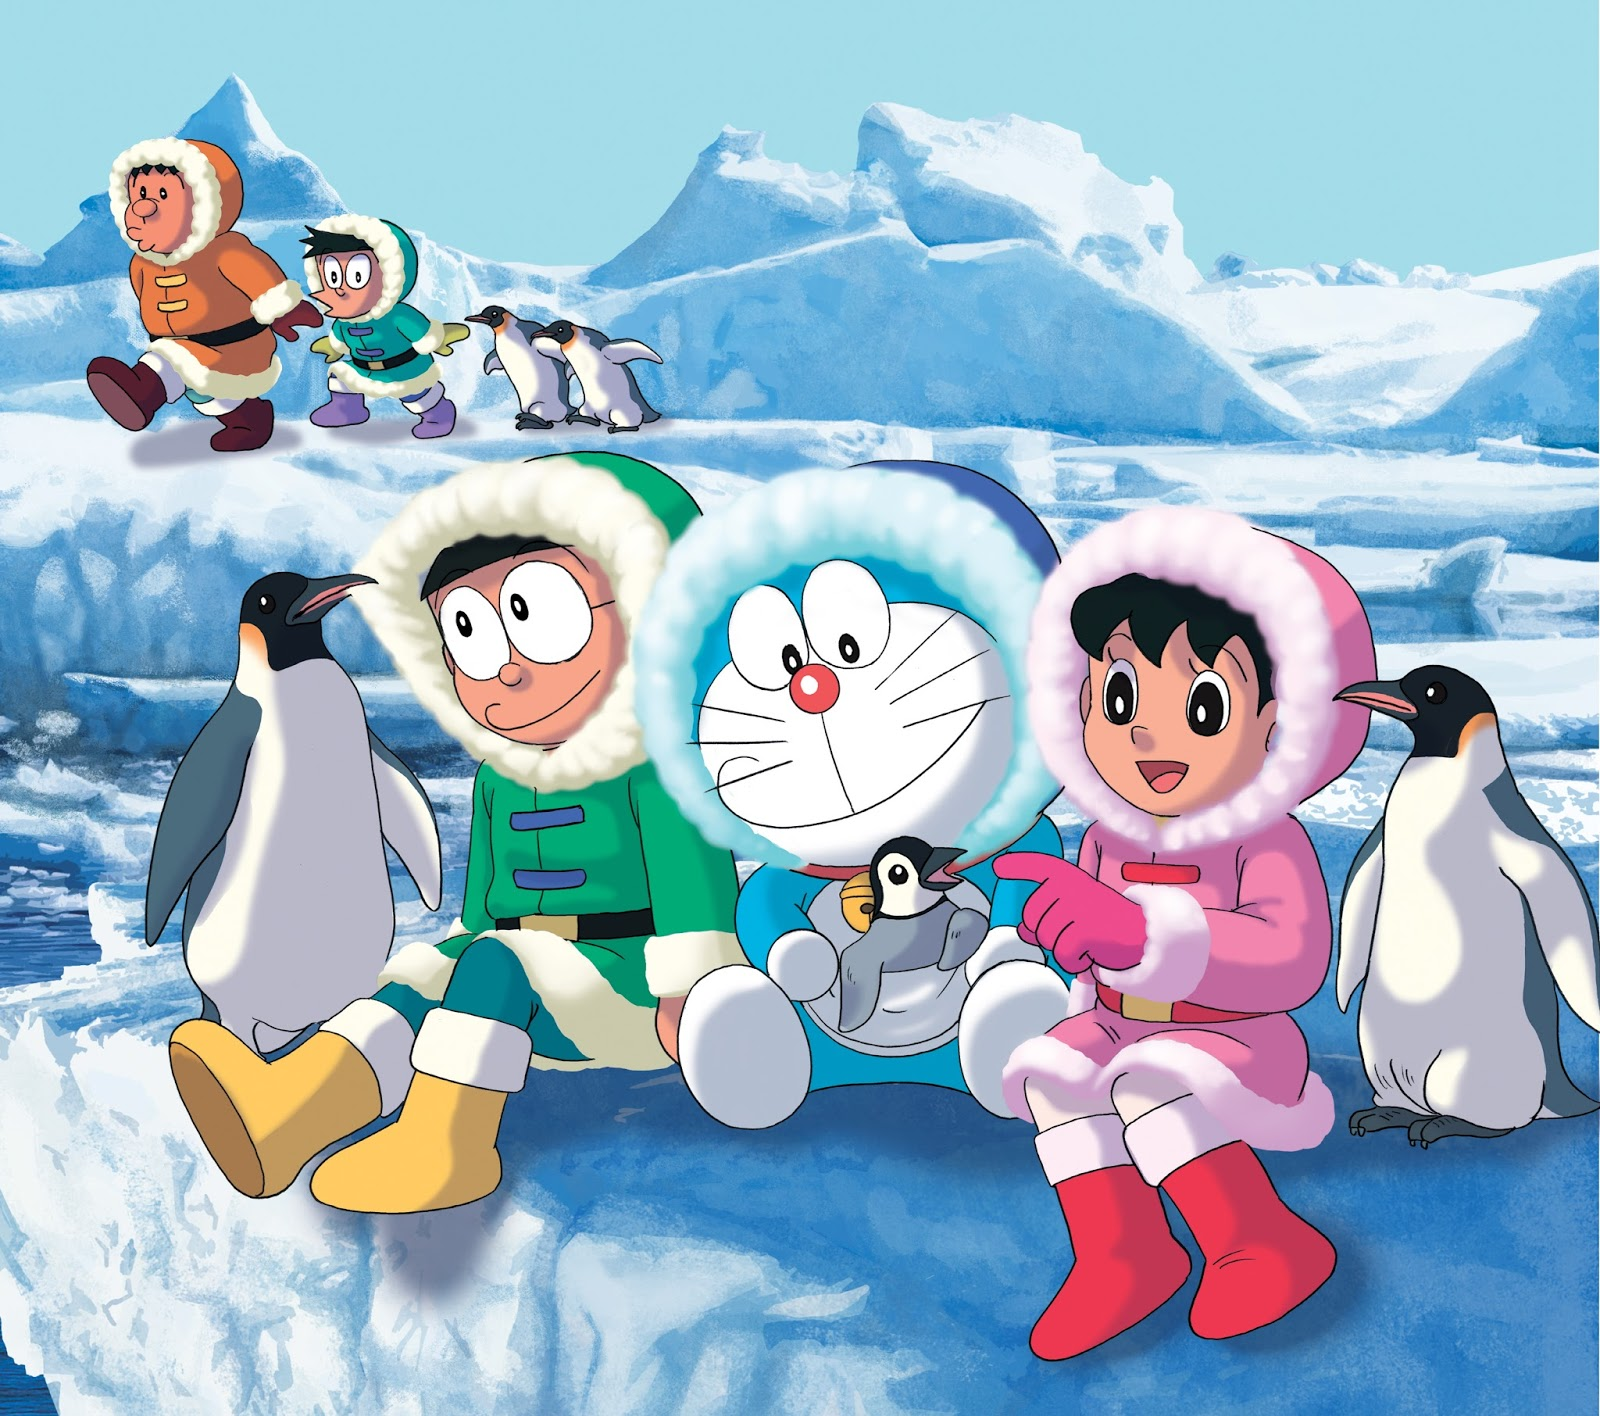 Doraemon cartoon Wallpapers Free by